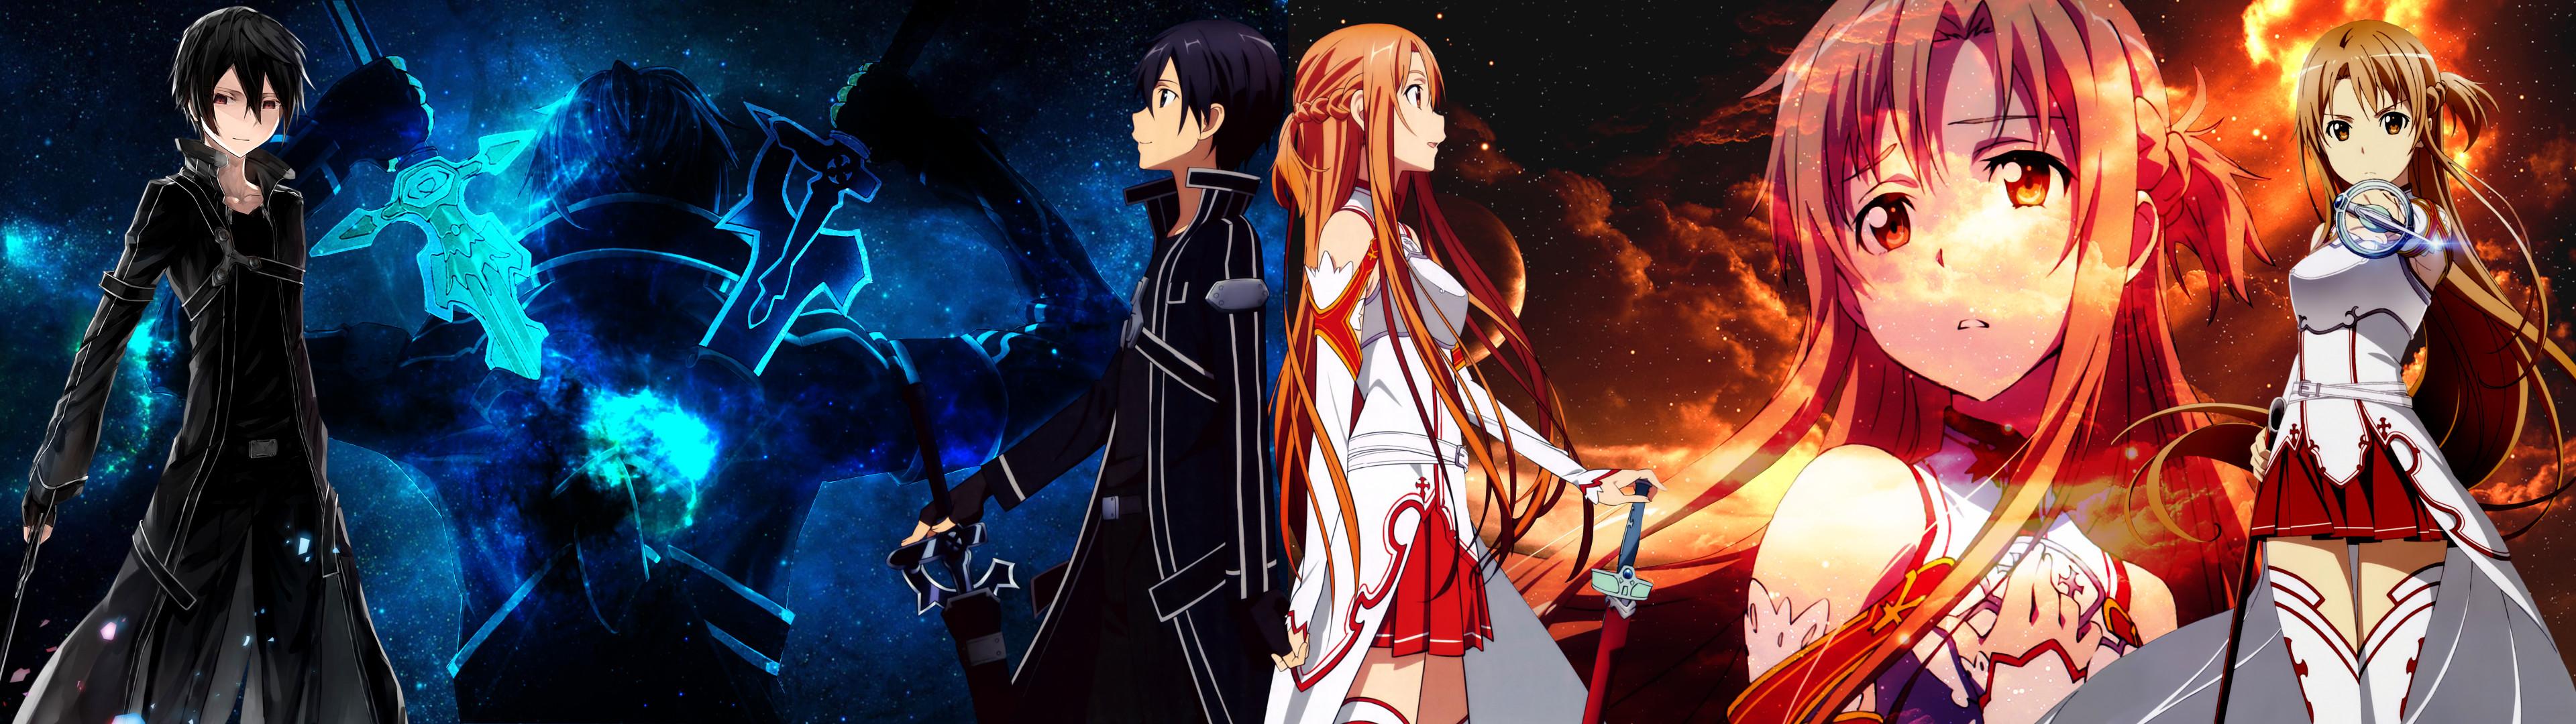 HD Wallpaper | Hintergrund ID:632079. Anime Sword Art Online